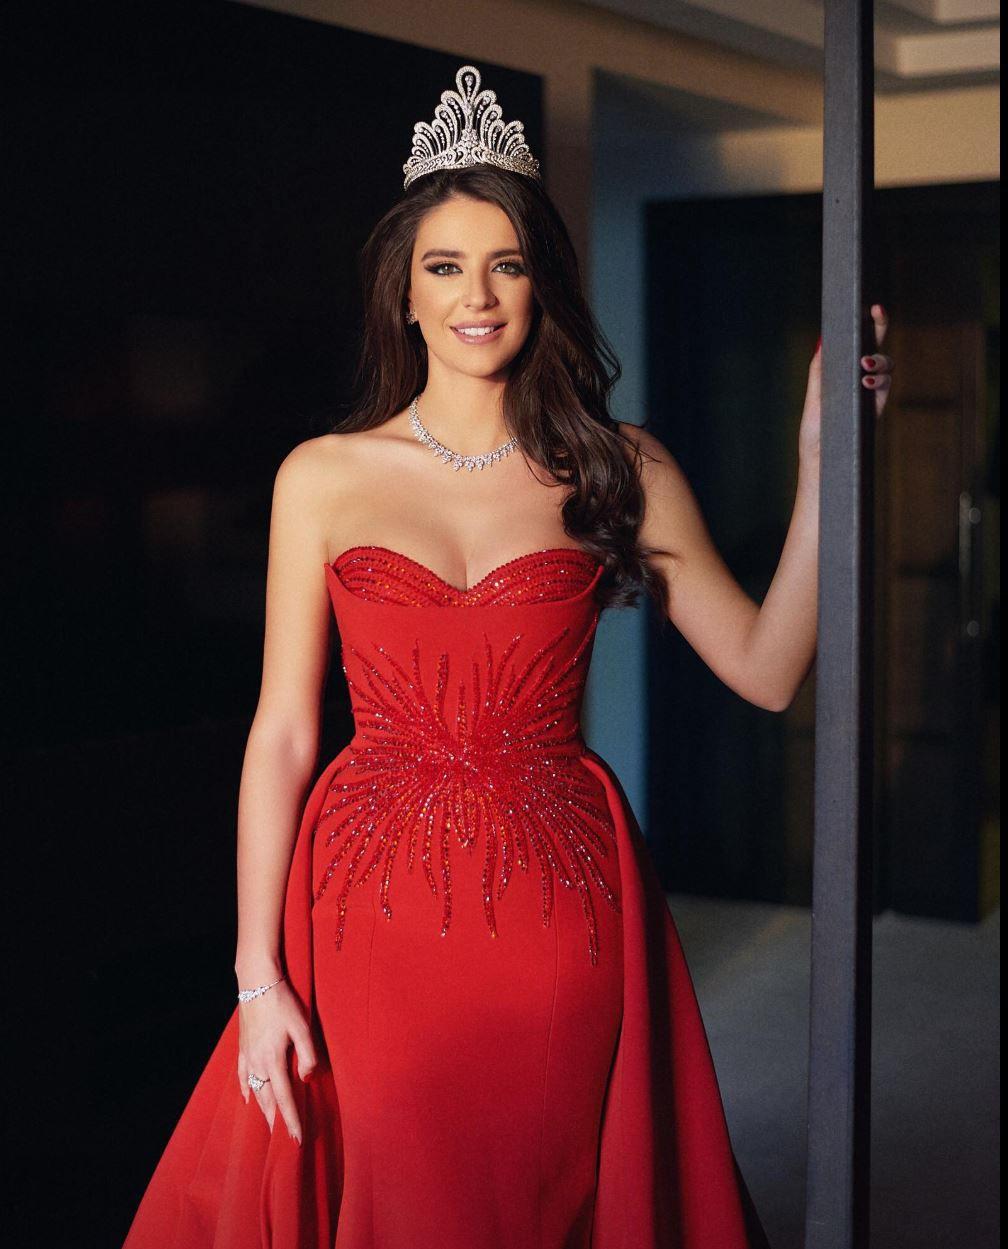 ملكة جمال لبنان 2017 بيرلا حلو